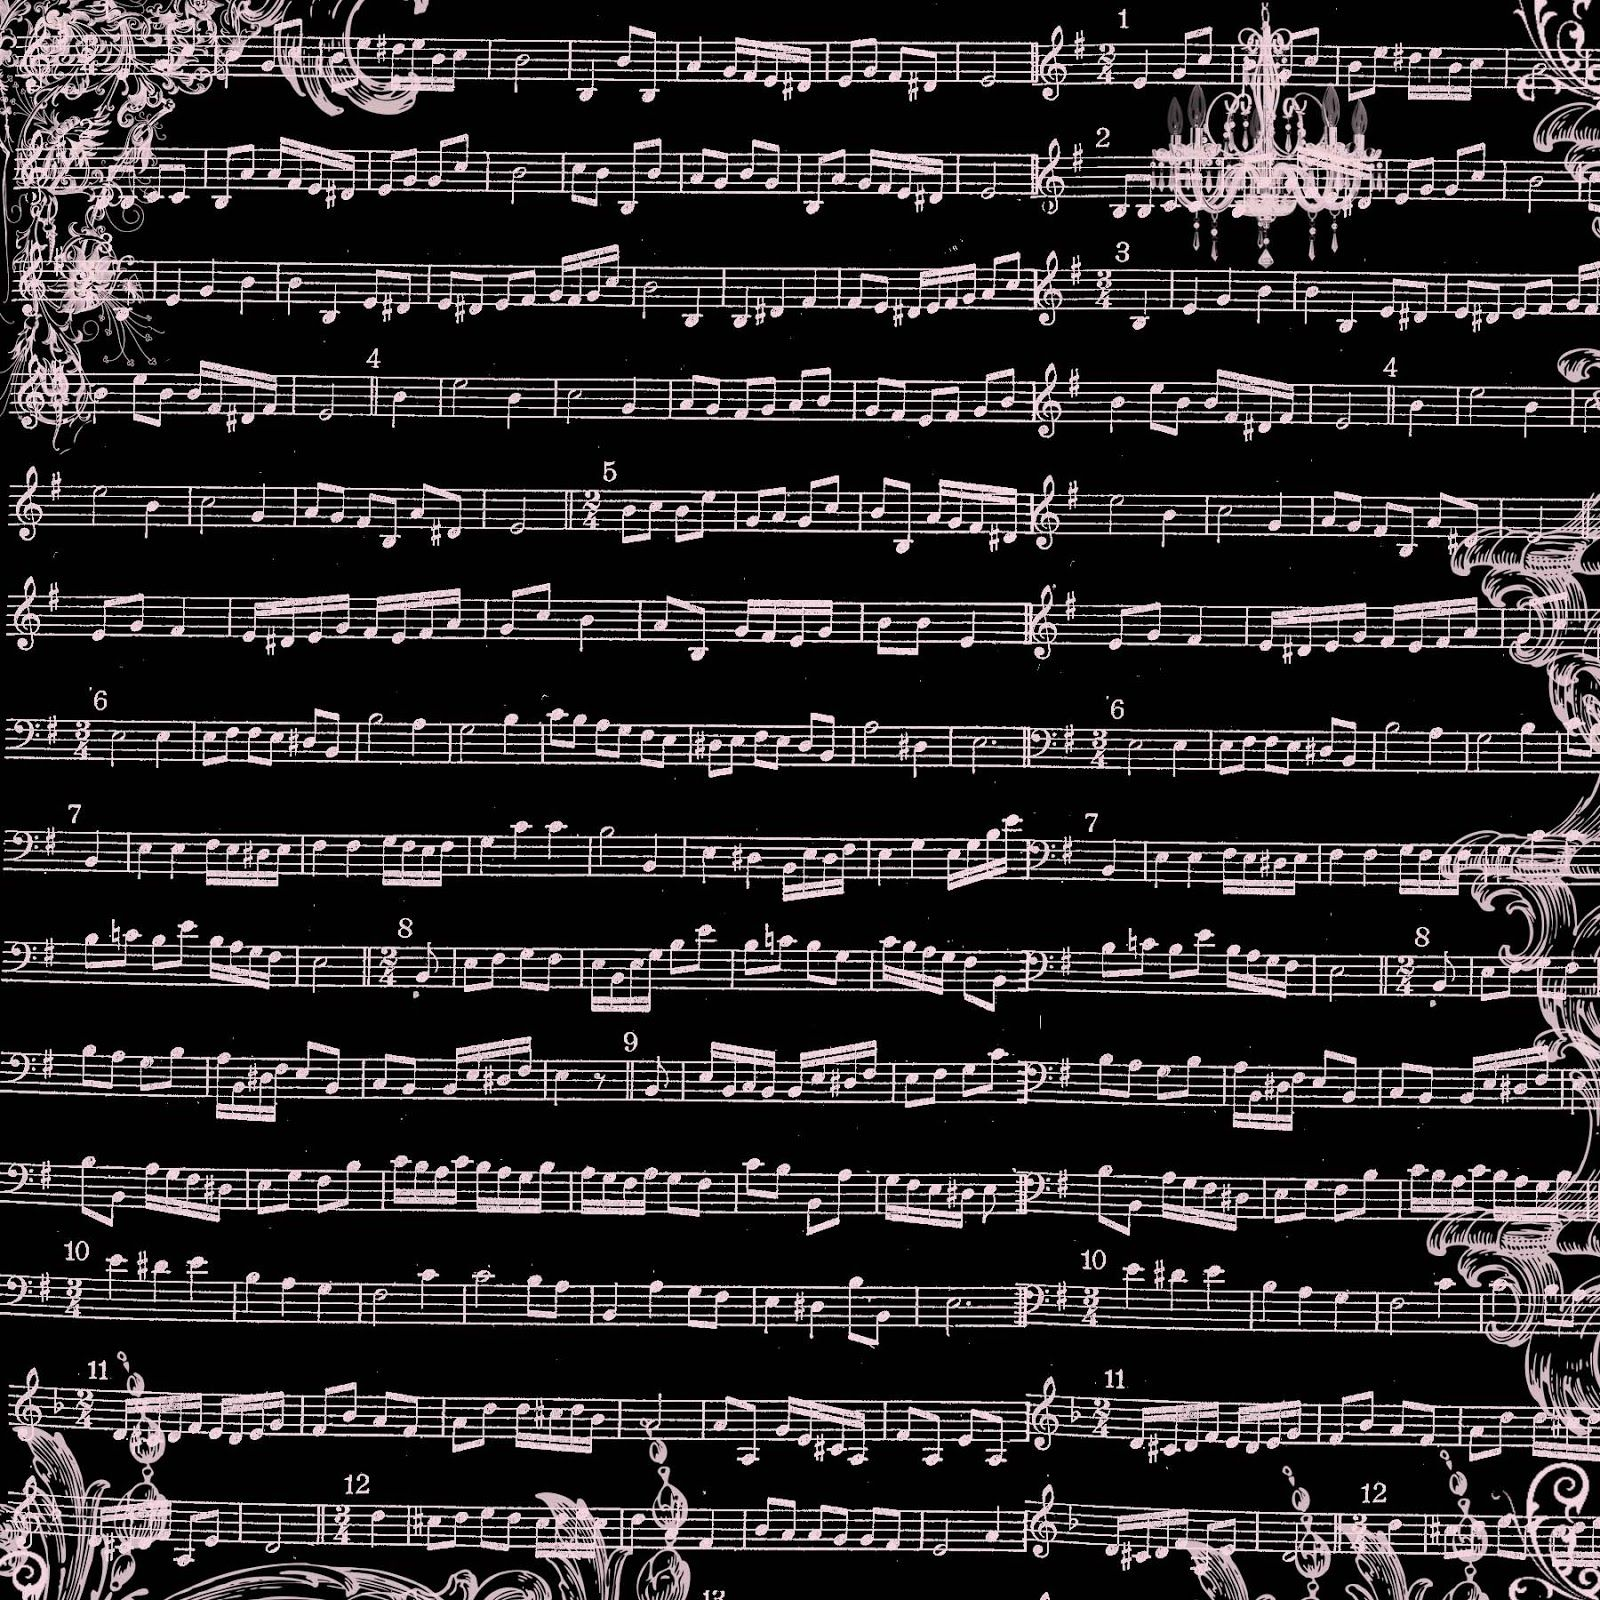 Sound of music scrapbook paper